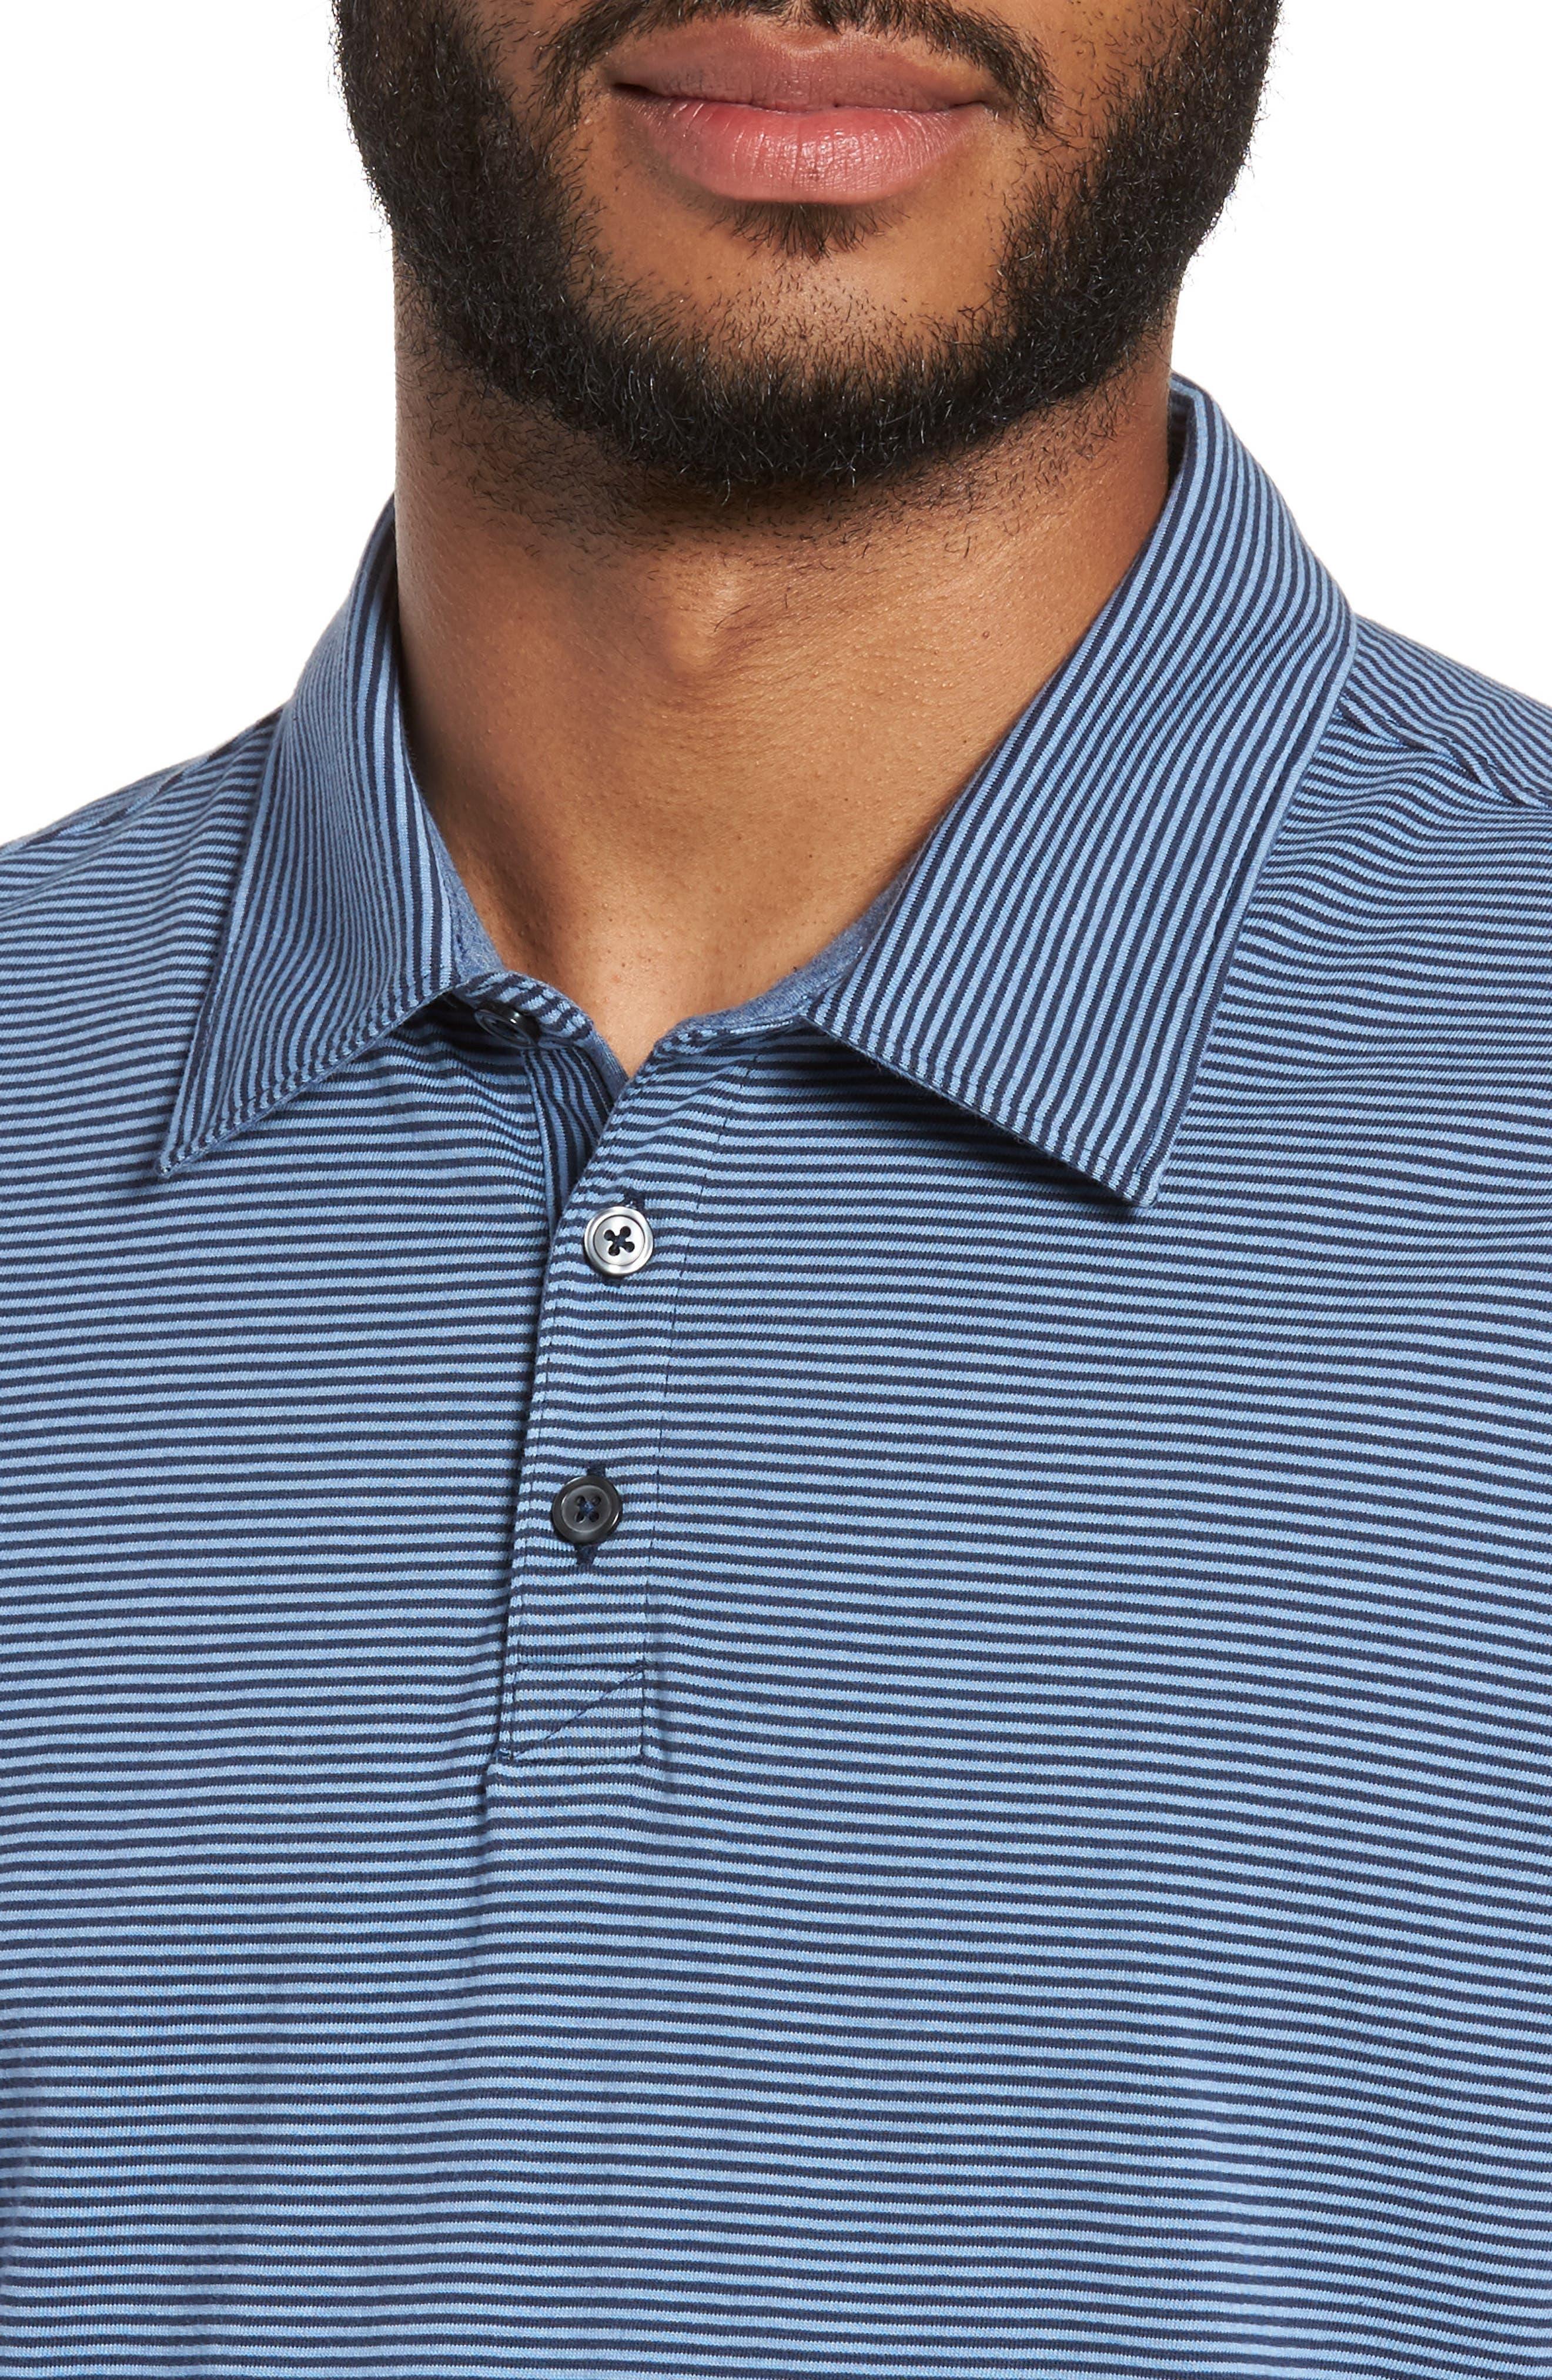 Gilmore Stripe Jersey Polo,                             Alternate thumbnail 4, color,                             BLUE